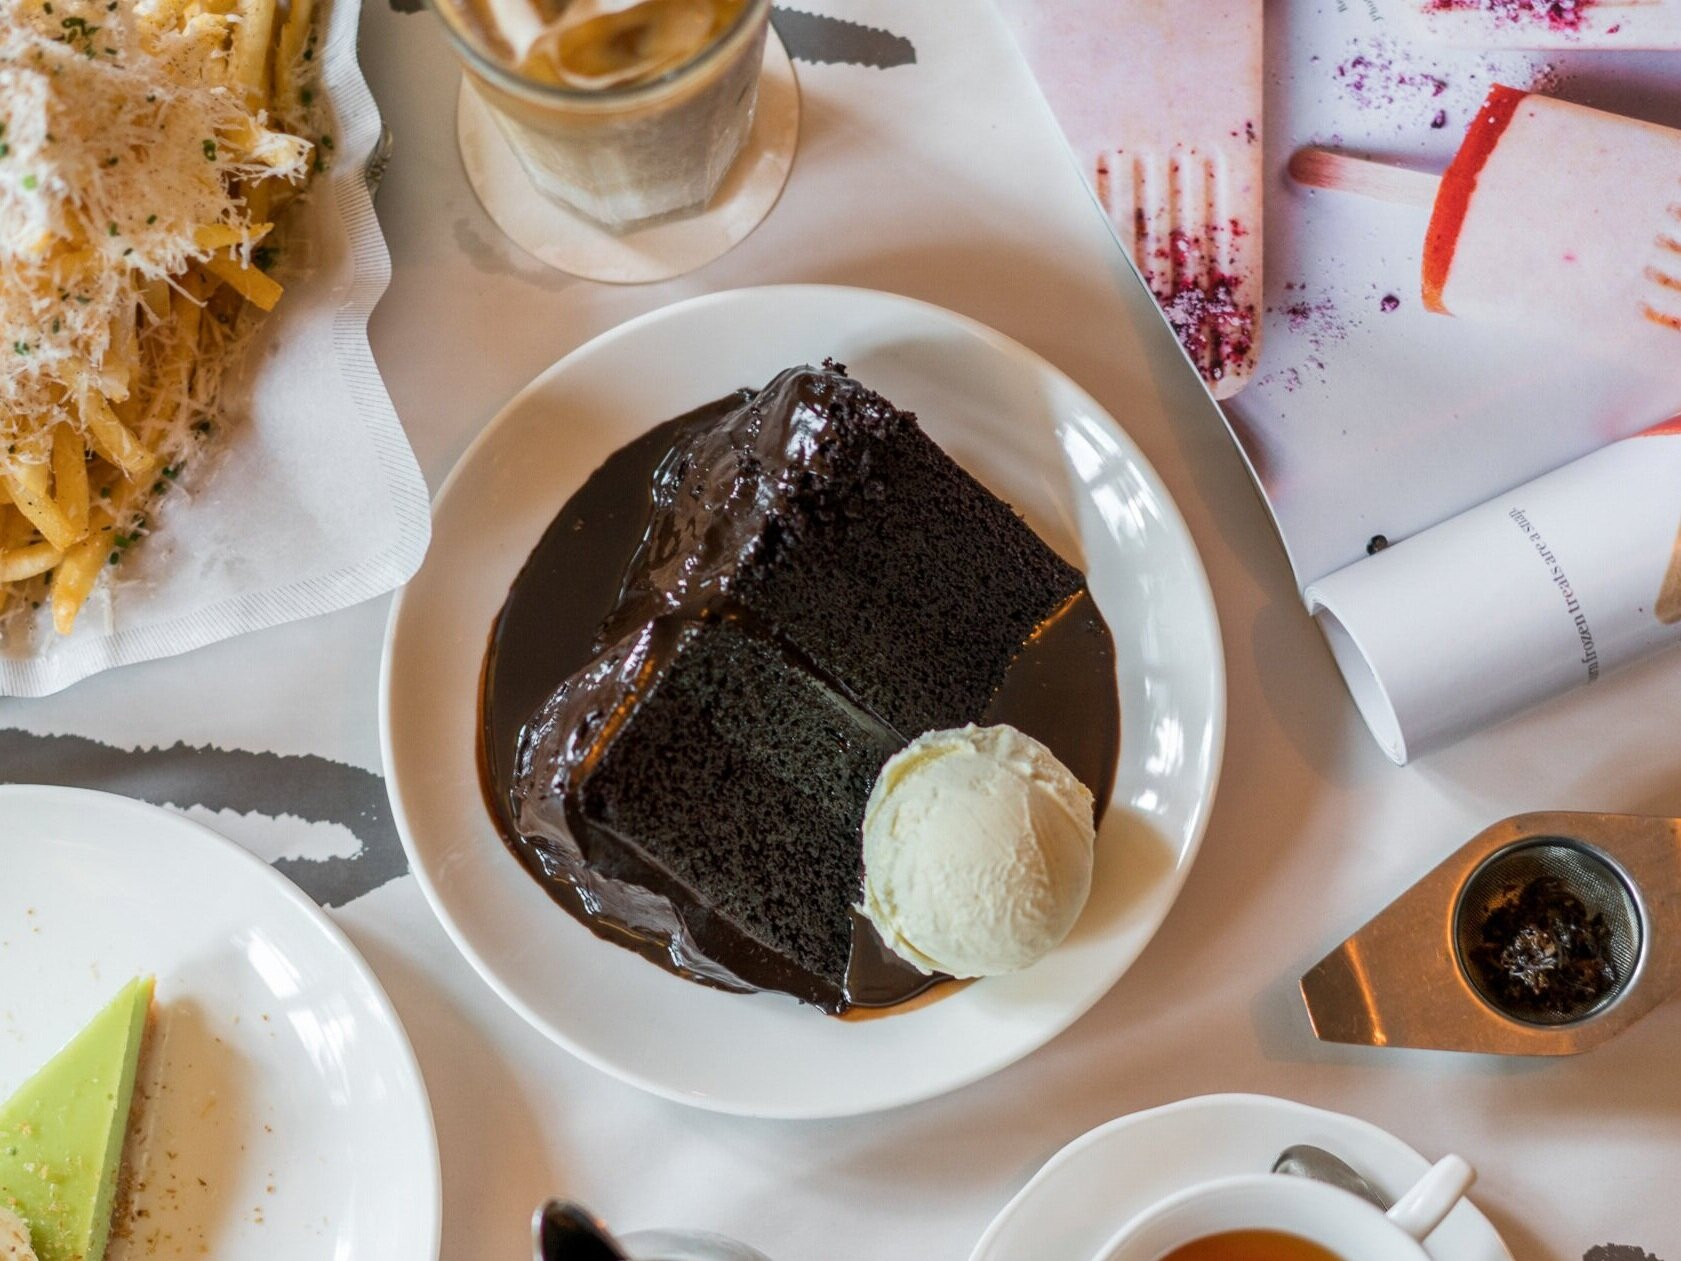 PS. Double Chocolate Blackout Cake / 더블 초콜렛 블랙아웃 케이크